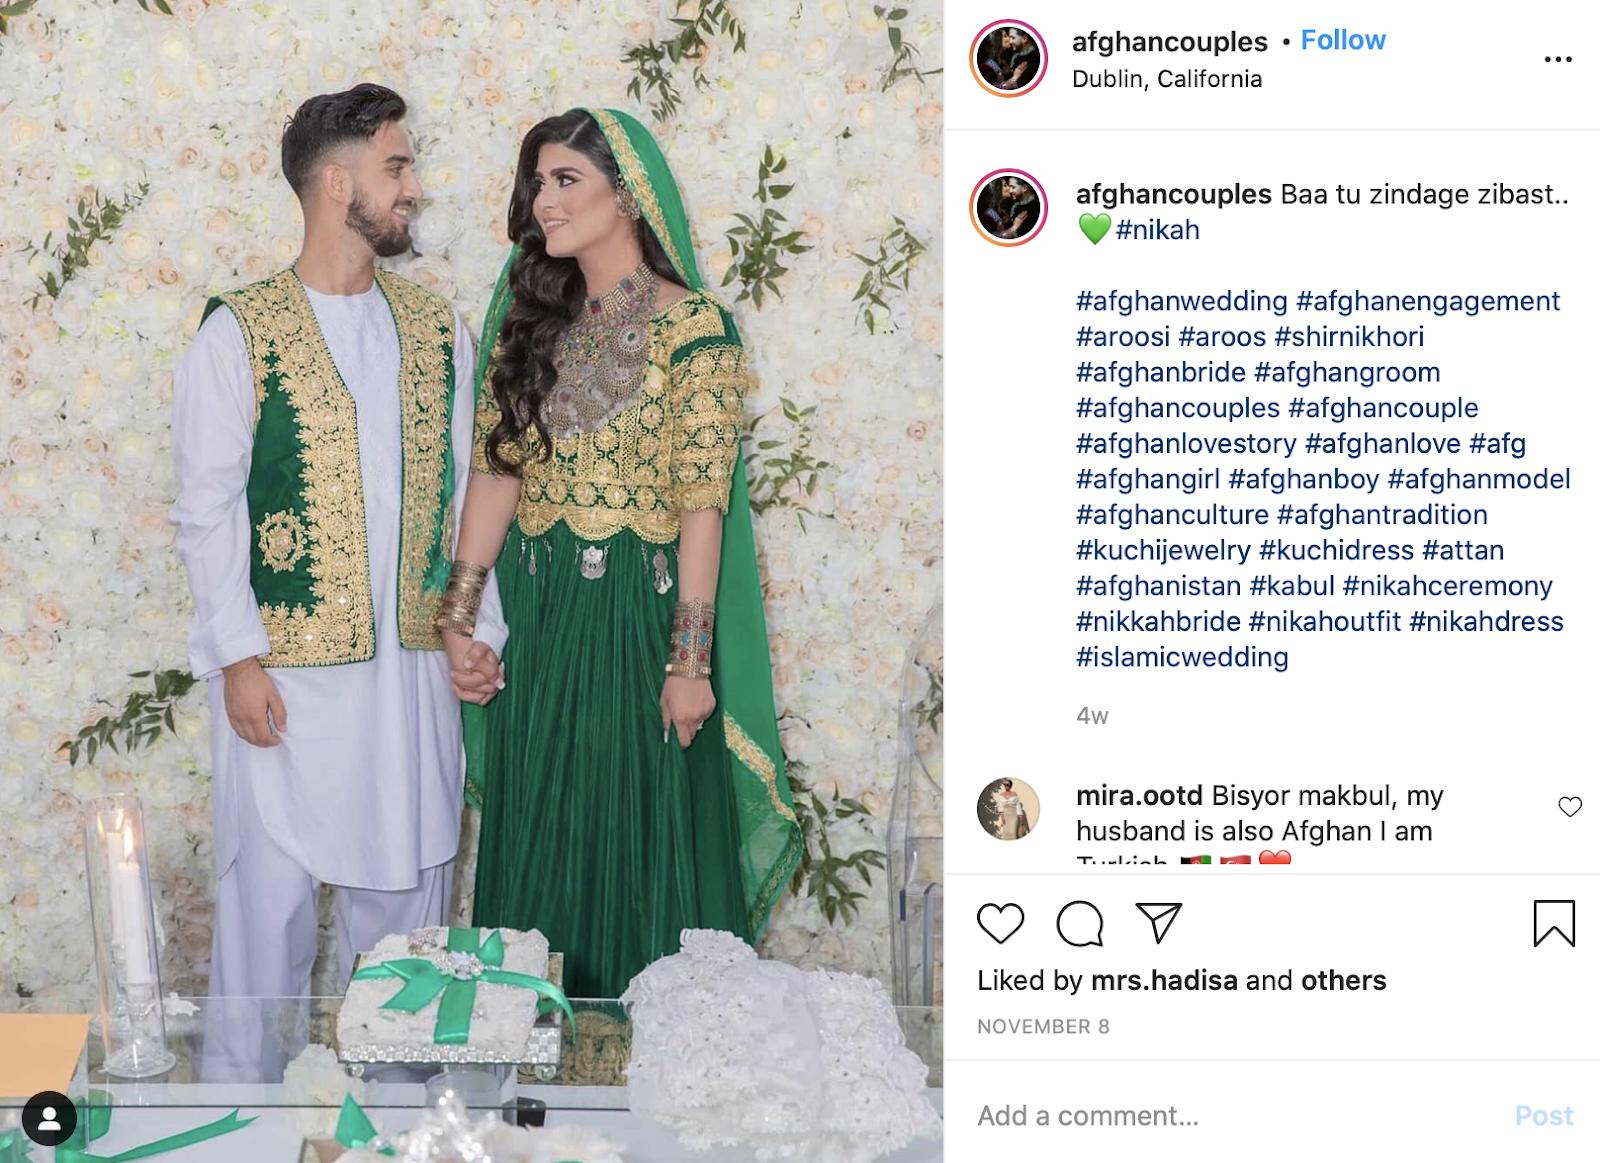 Islamic order of wedding ceremony